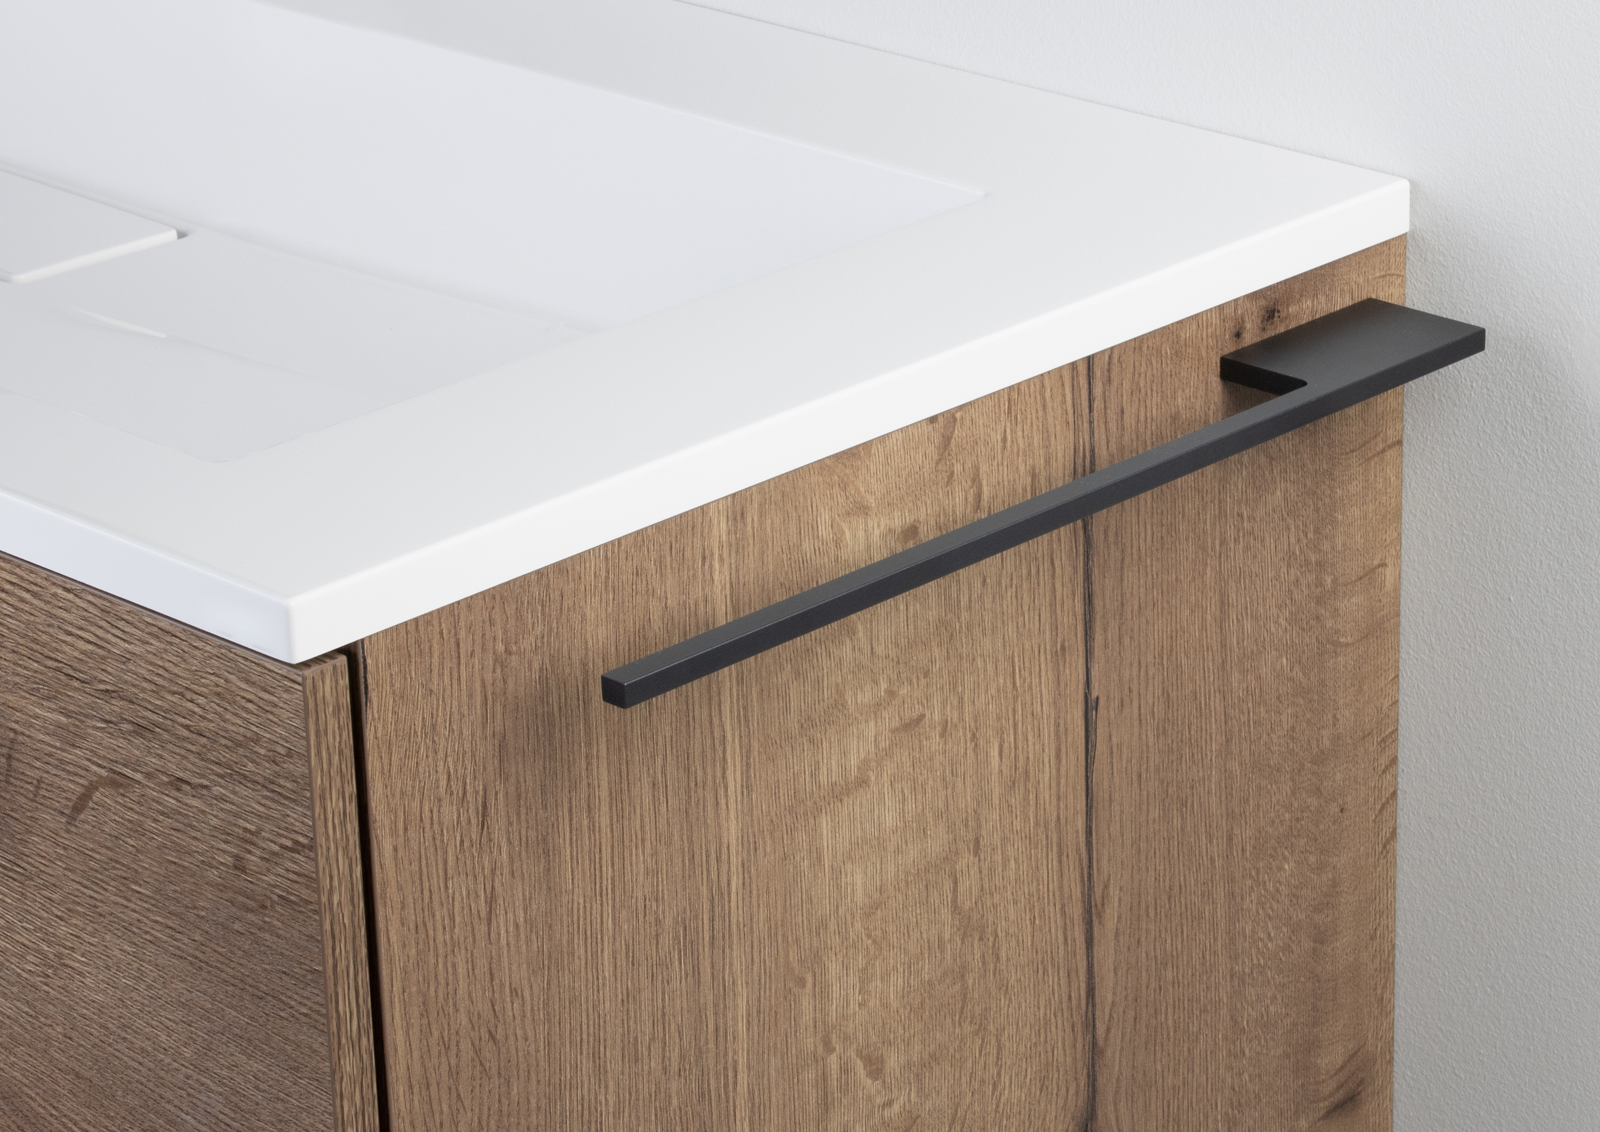 Handtuchhalter Bad Anthrazit Accessoires Design